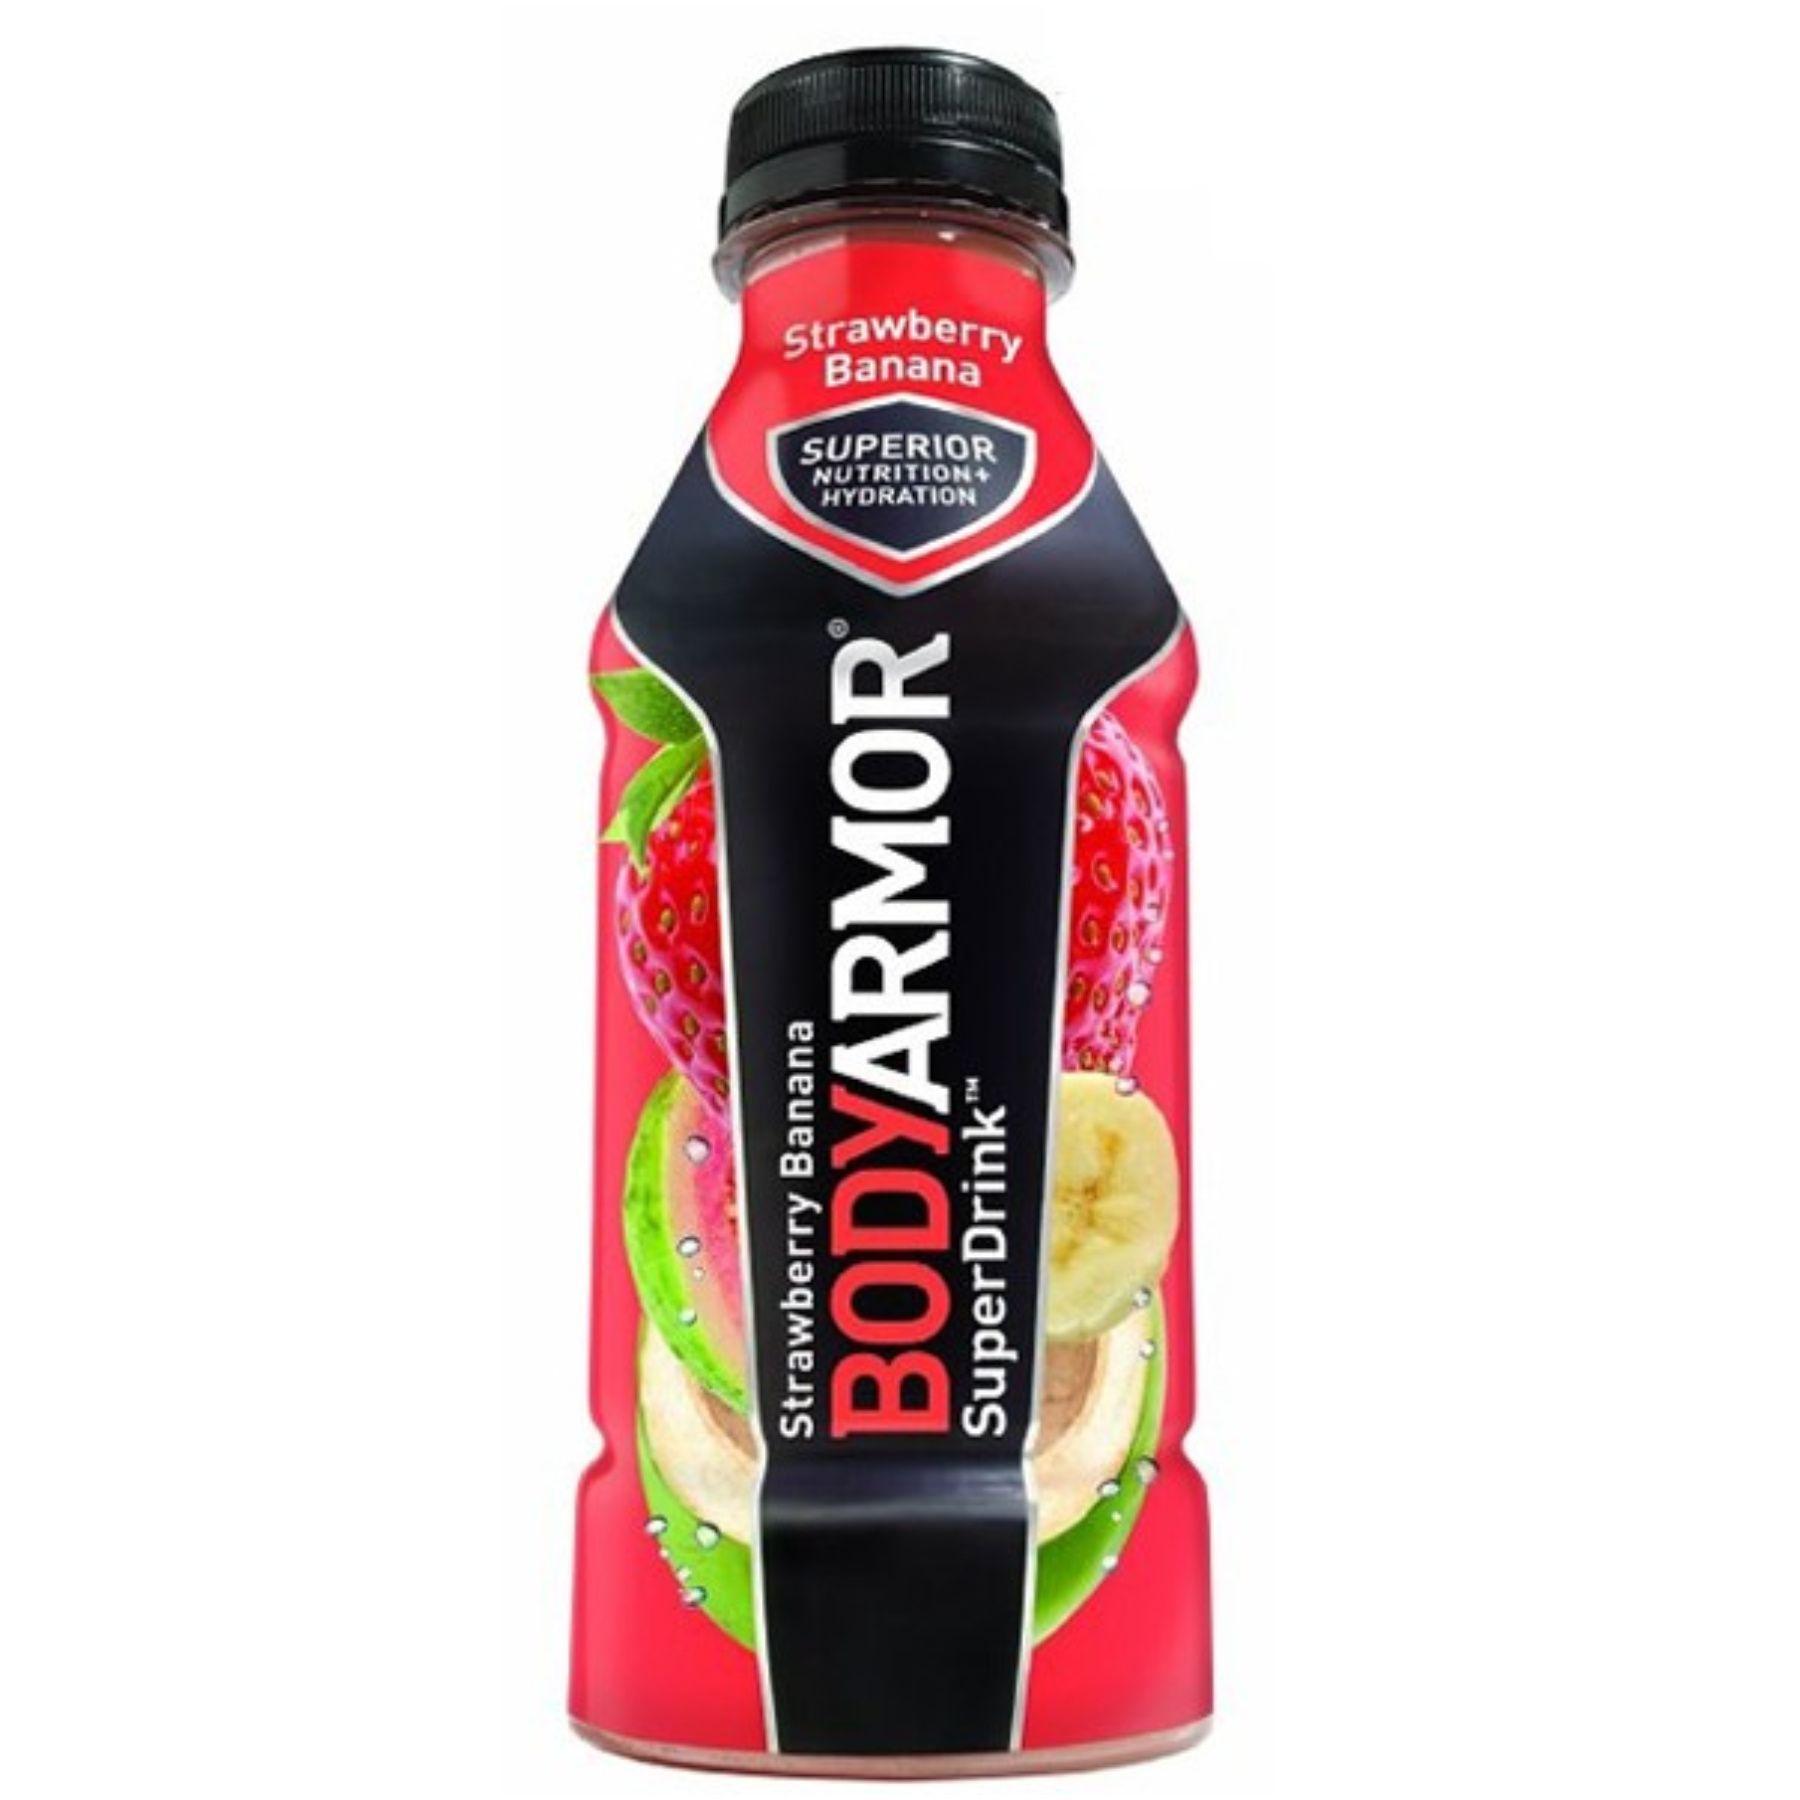 Body Armor Strawberry Banana Sports Drink blends